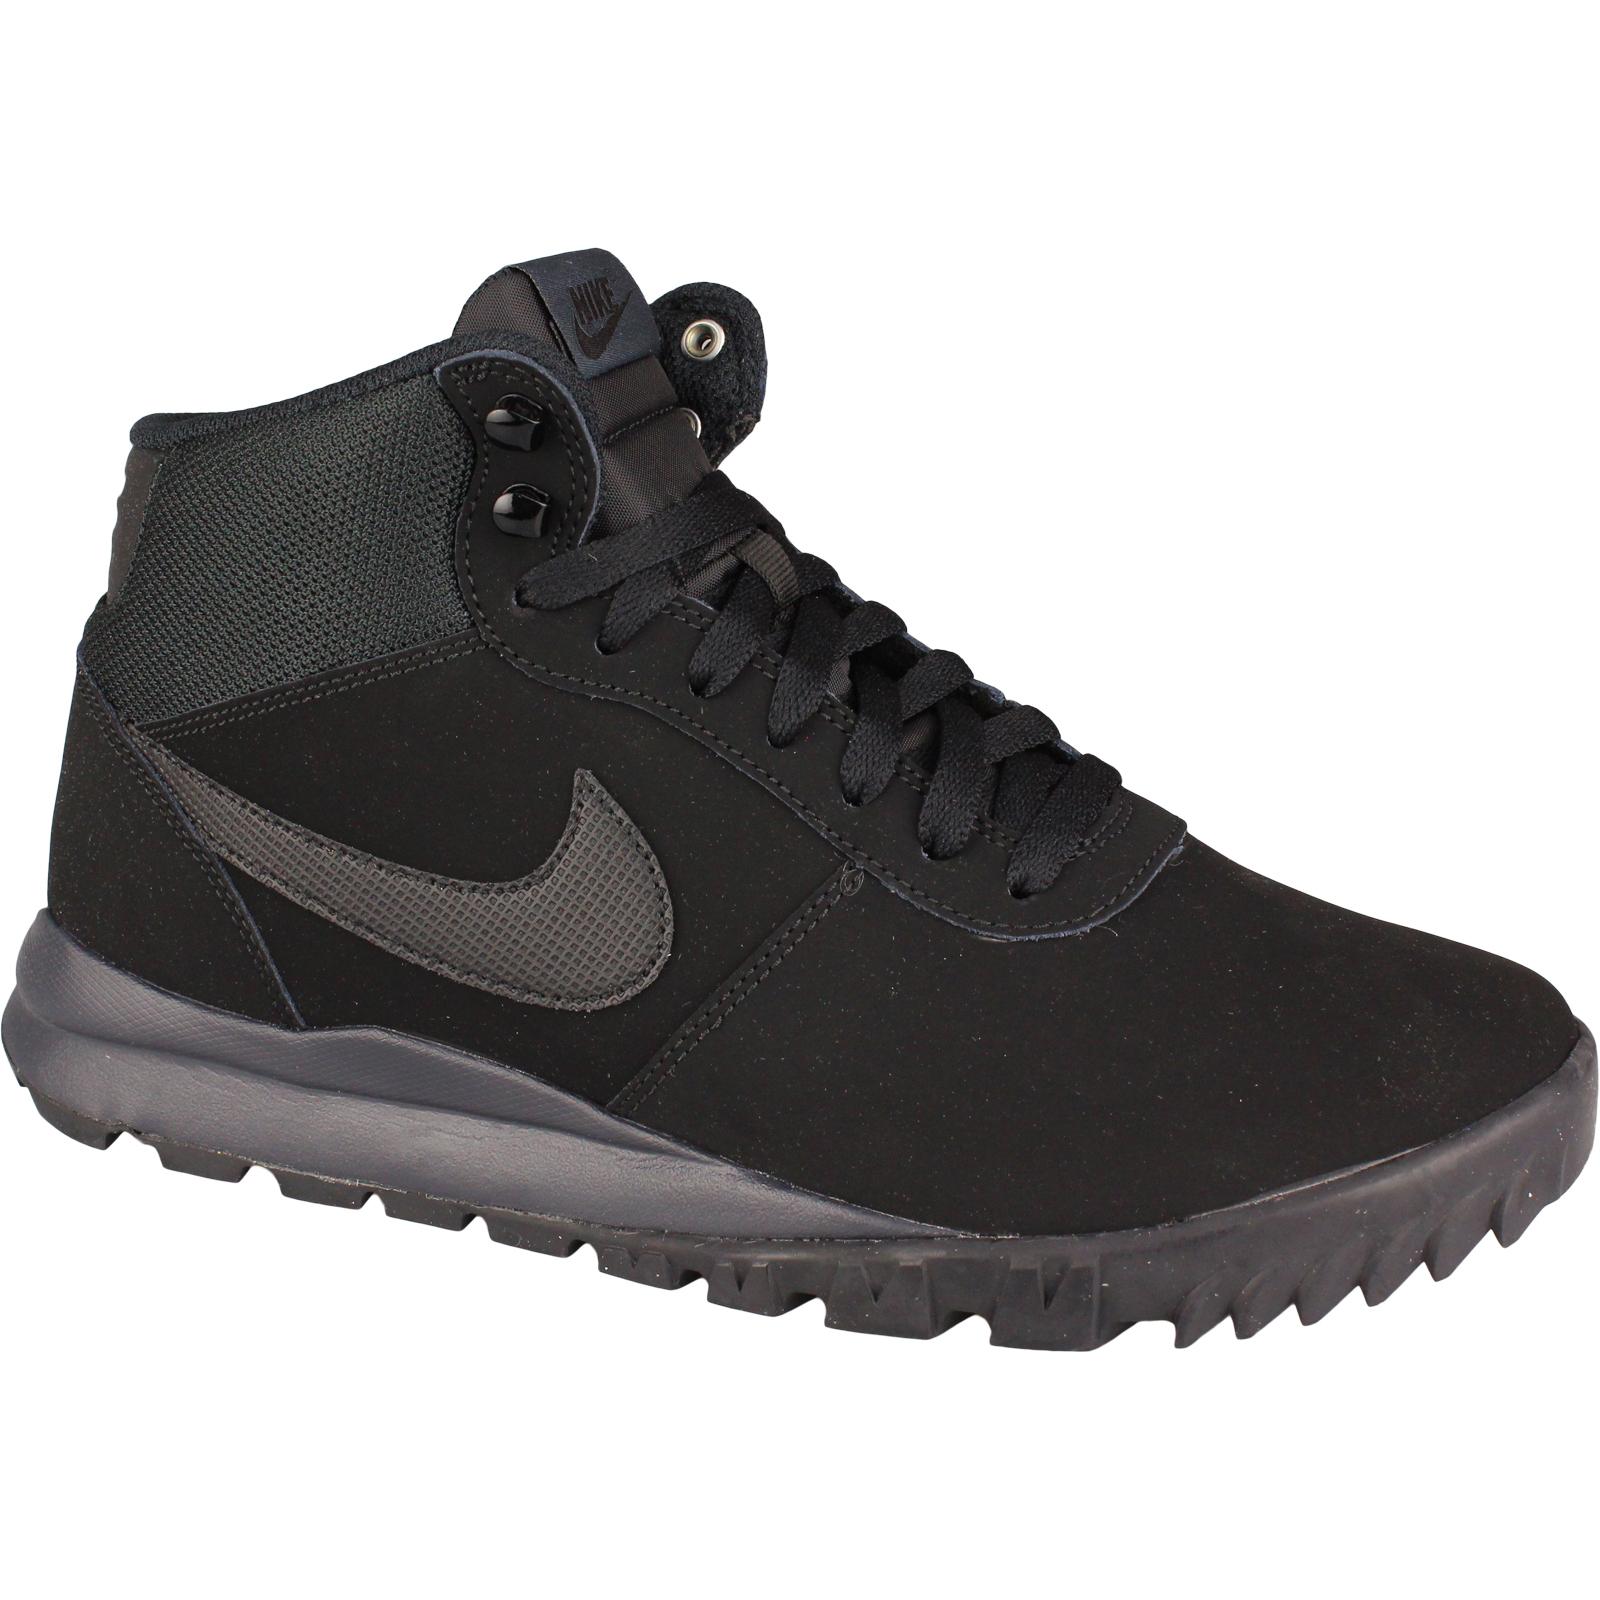 nou ridicat adidași diferit Ghete barbati Nike Hoodland Suede 654888-090 - Nike - Ghete ...